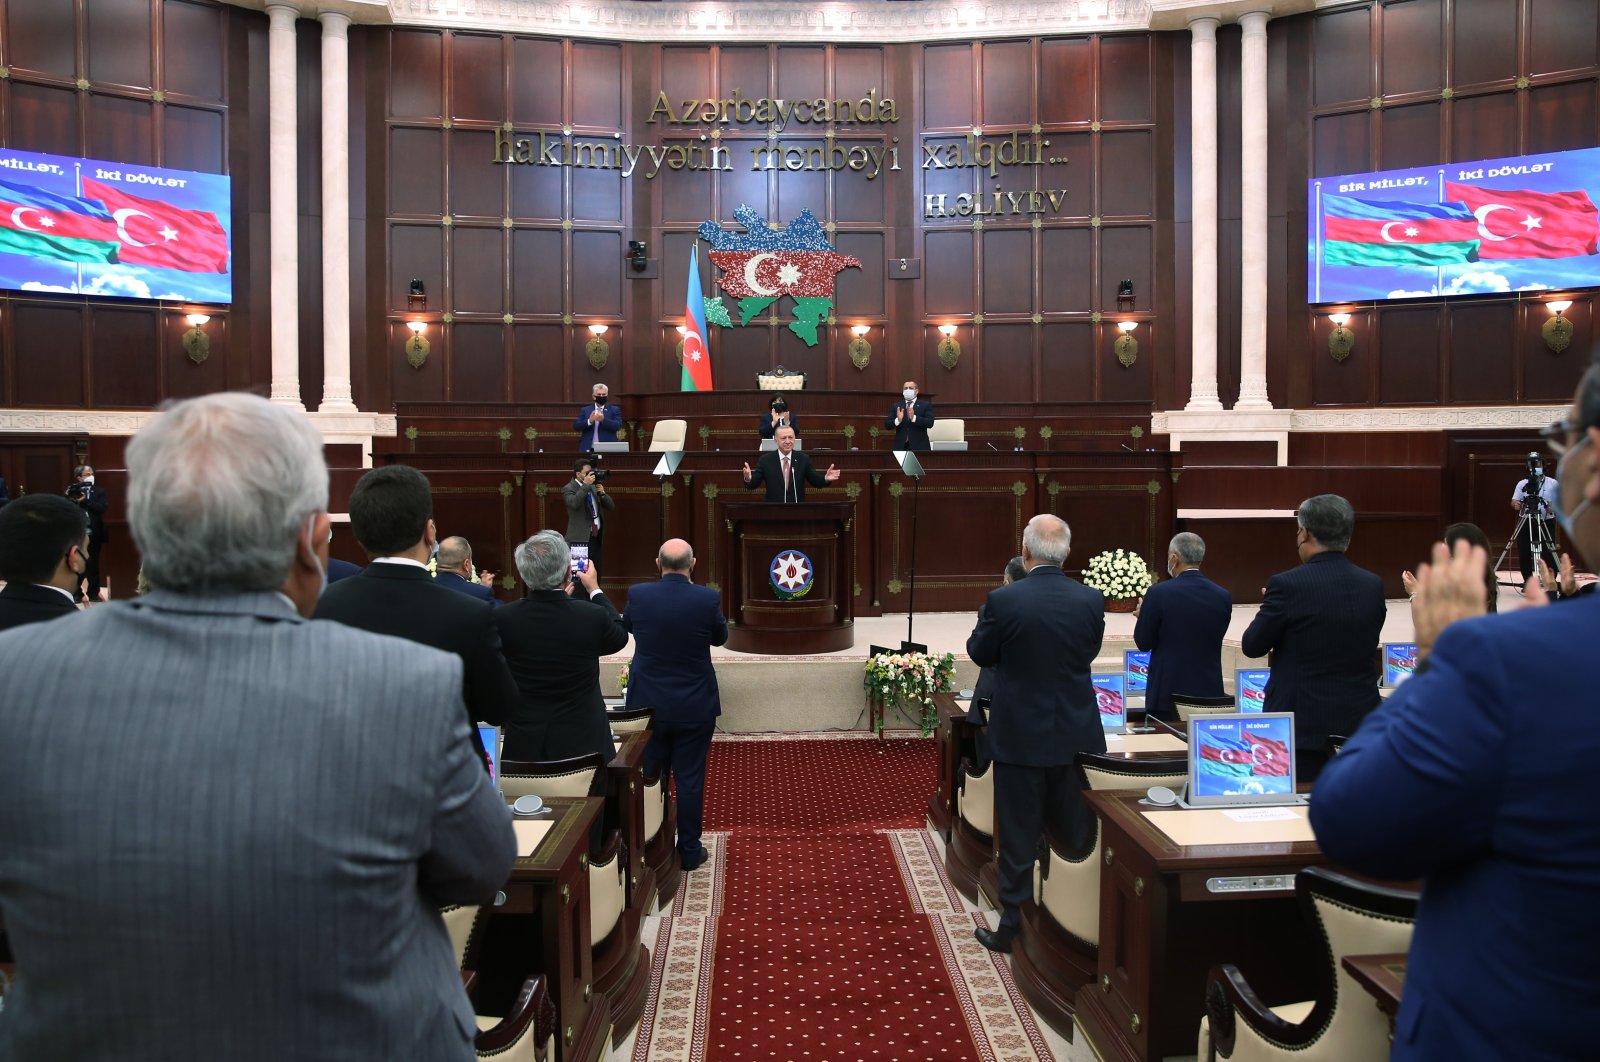 President Recep Tayyip Erdoğan addresses the Azerbaijani parliament, Shusha, Azerbaijan, June 16, 2021. (AA File Photo)